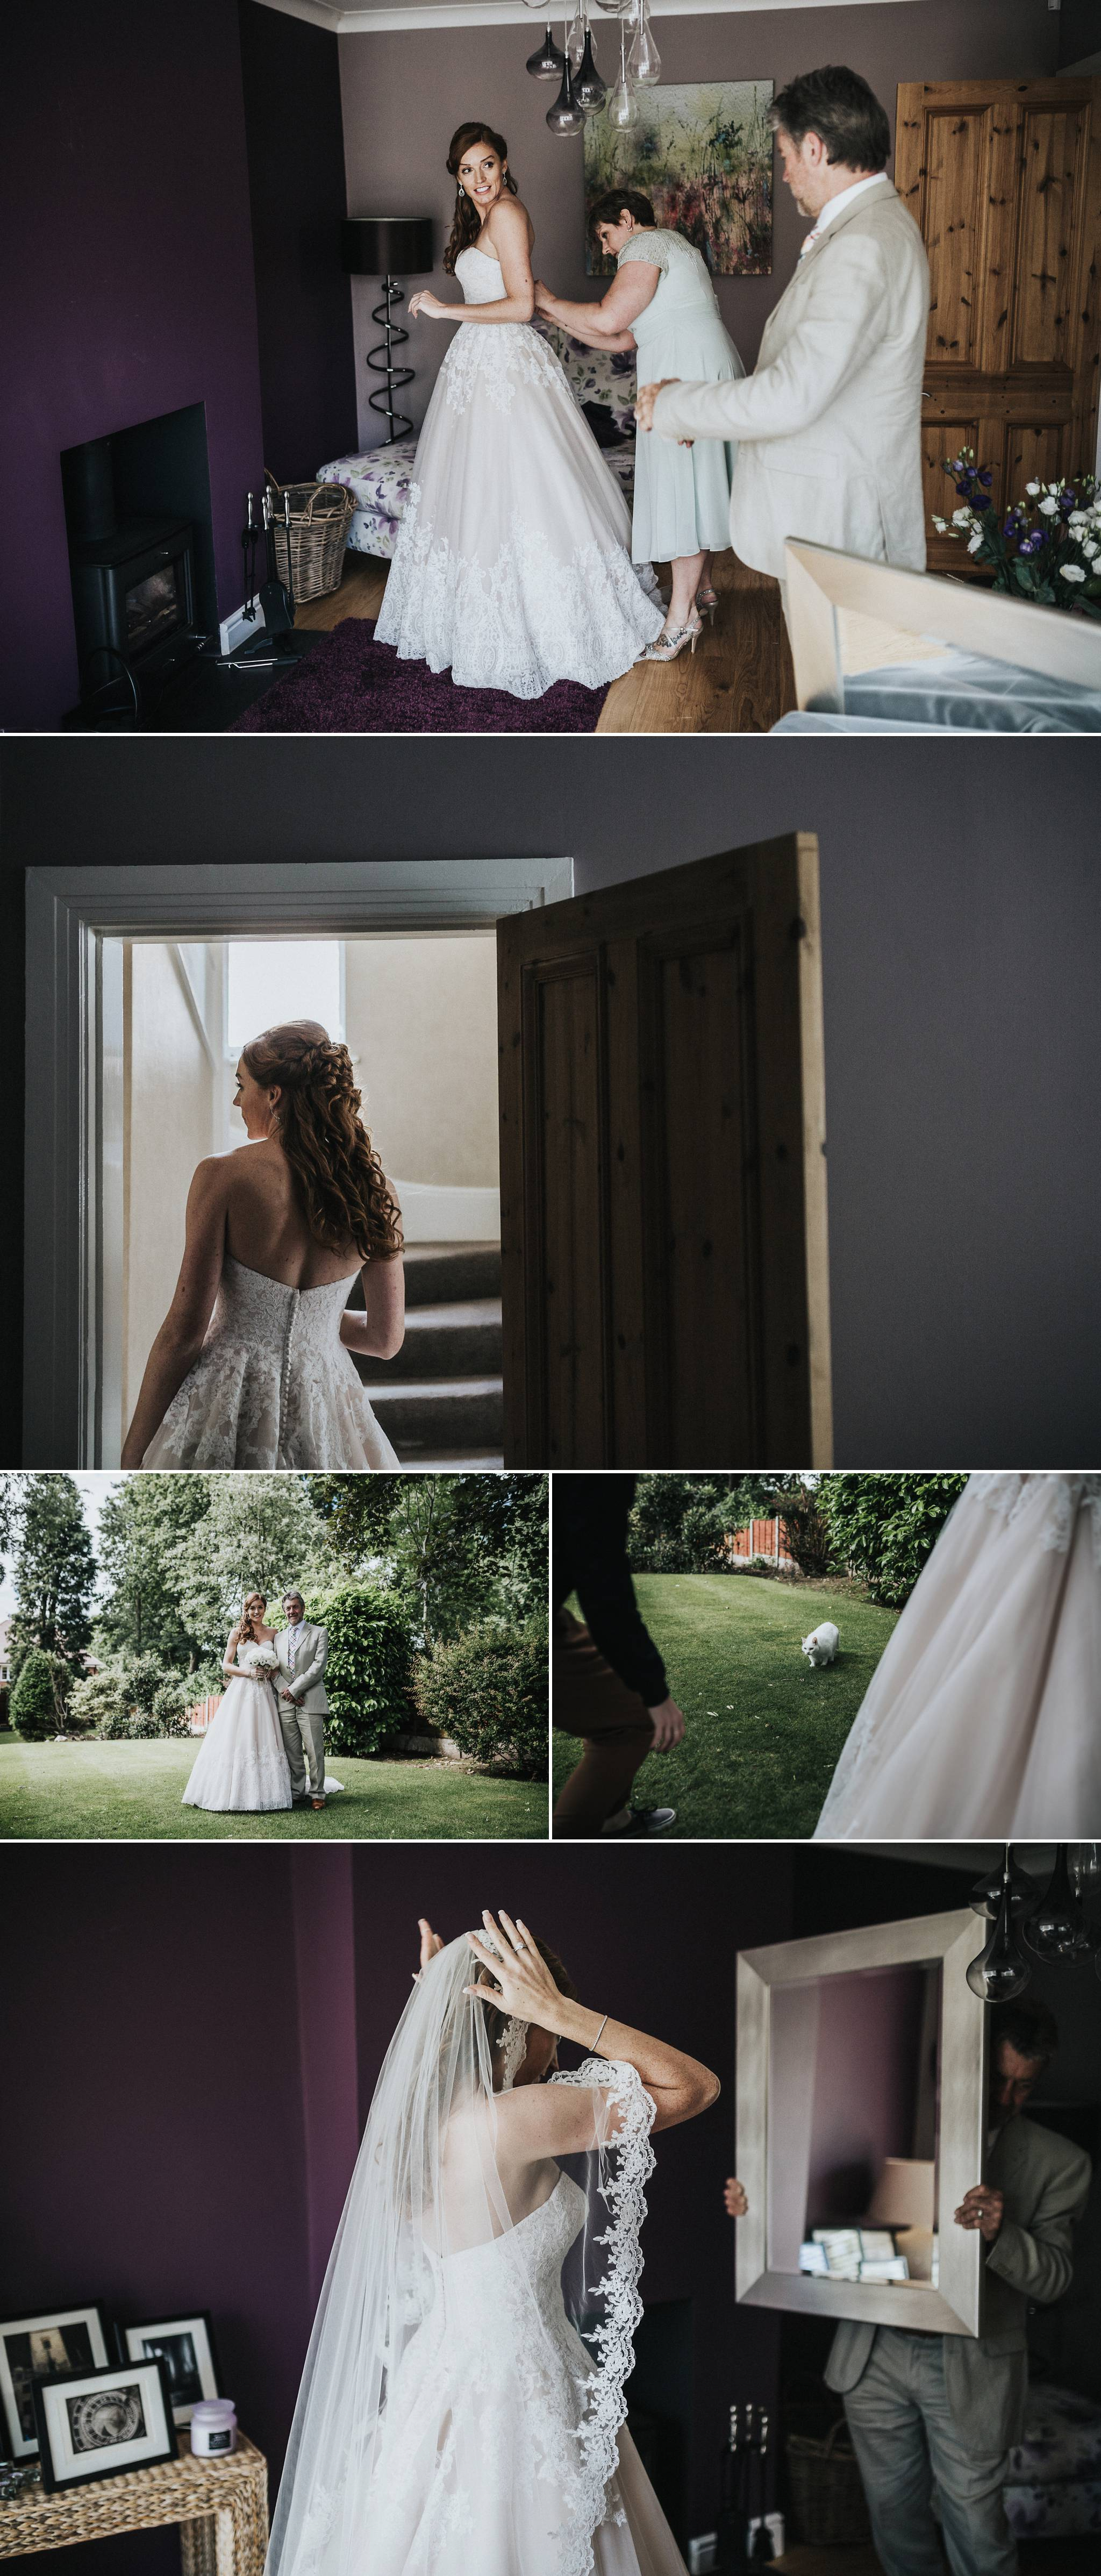 wedding-photographer-staffordshire 4.jpg